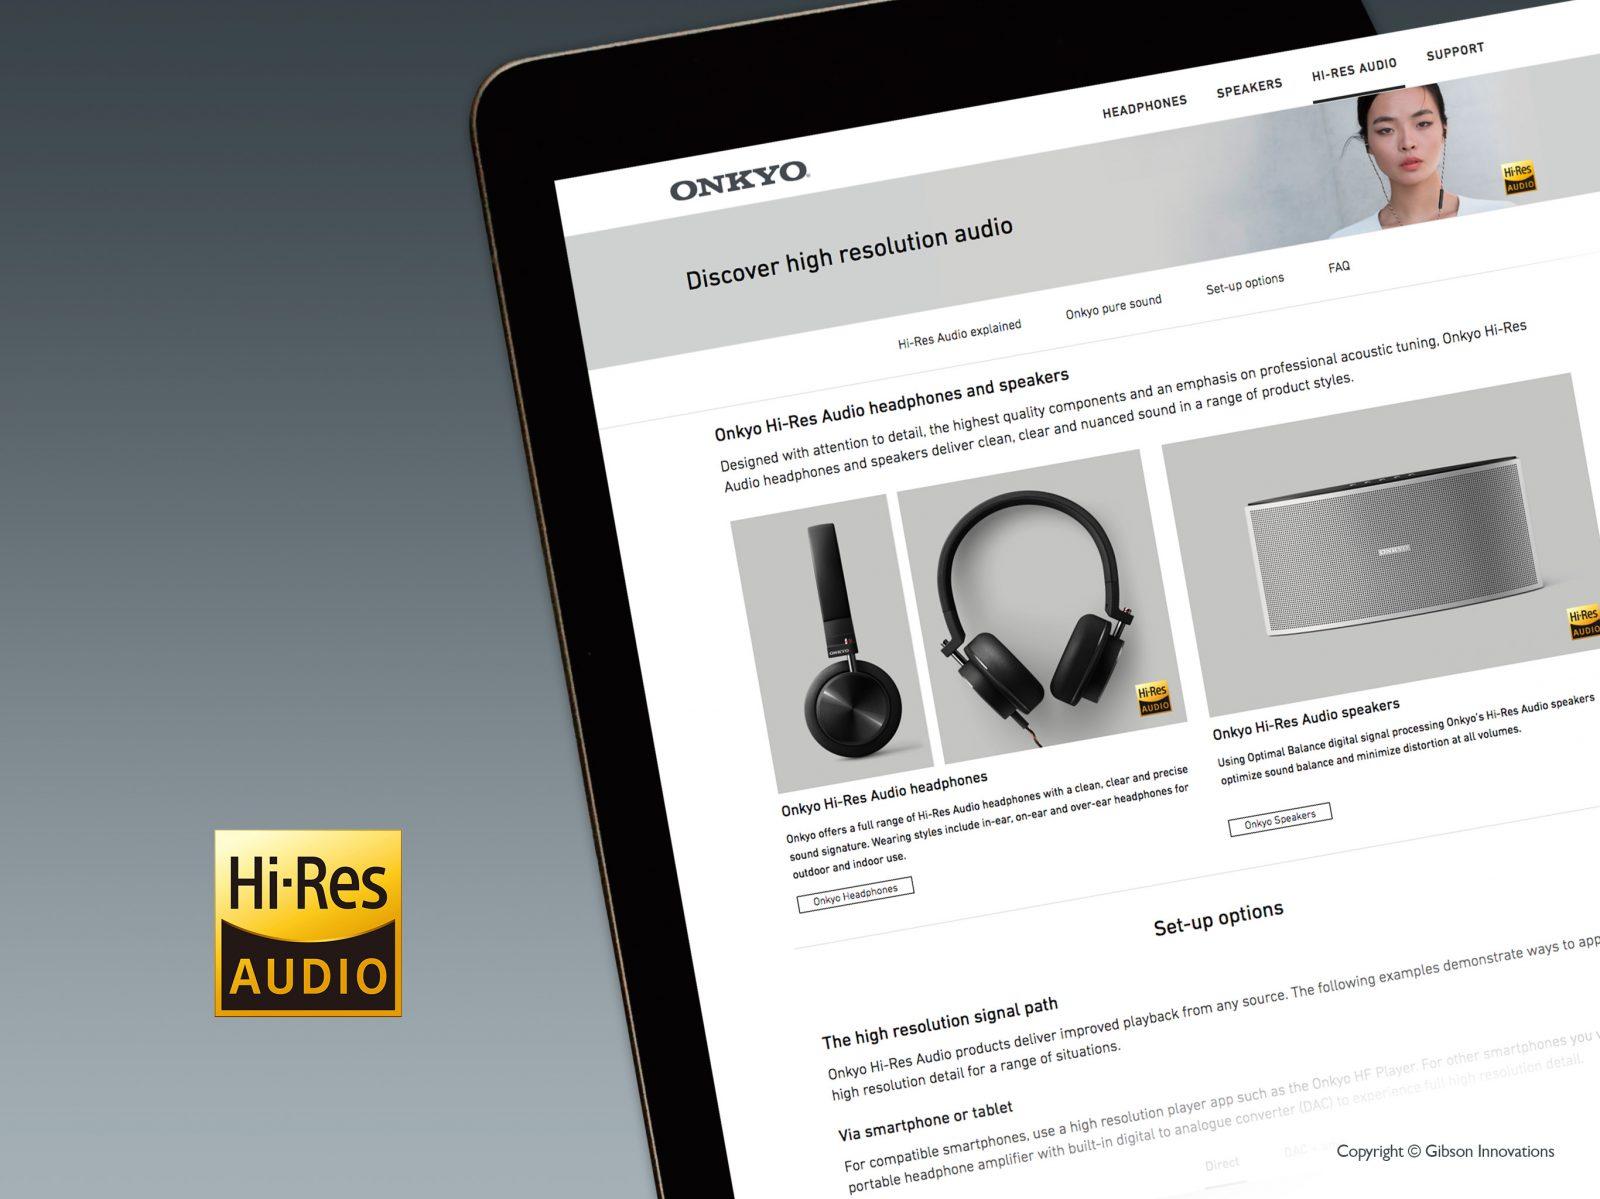 Creating content for Hi-Res Audio